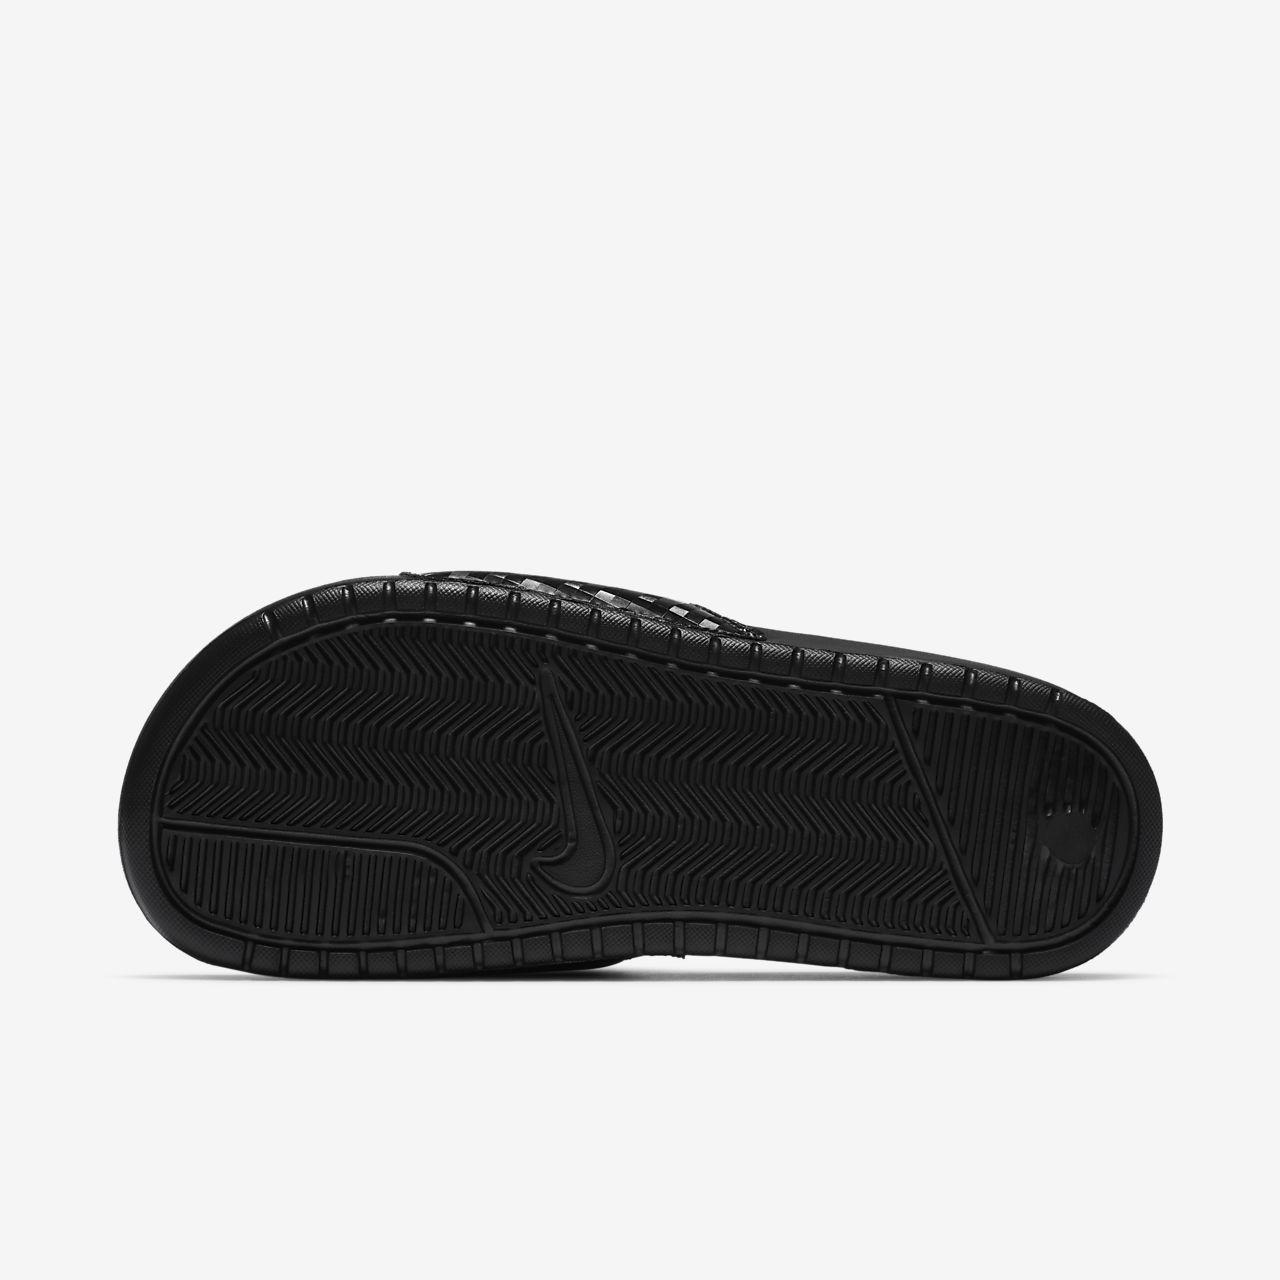 huge discount e6115 26546 Low Resolution Nike Benassi Women s Slide Nike Benassi Women s Slide